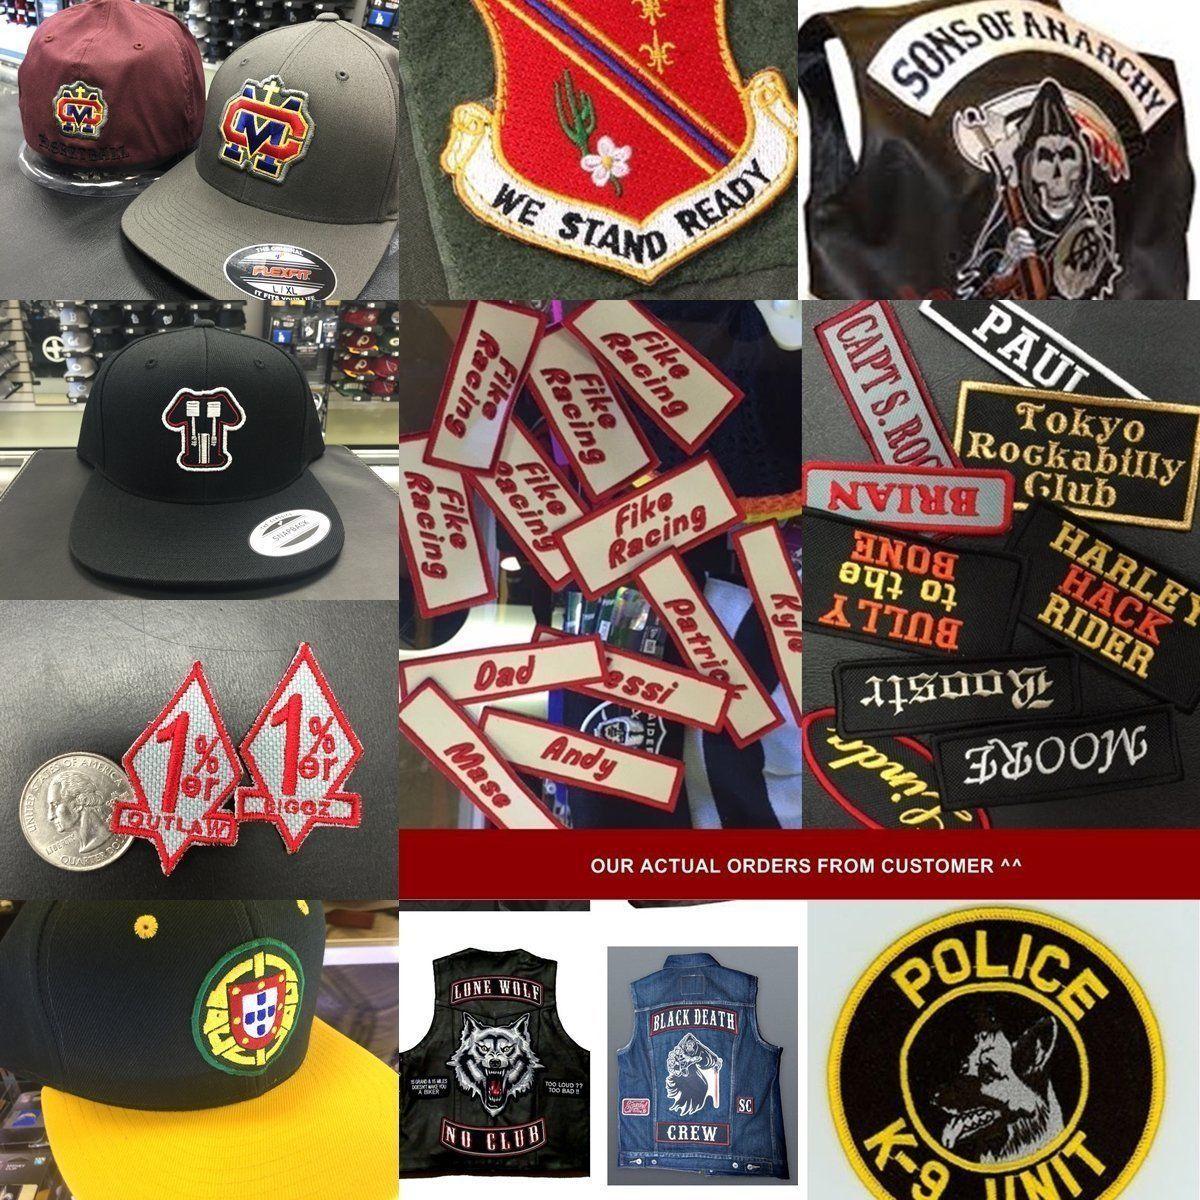 "Custom Embroidered Rocker Patch Biker Patch Club Outlaw MC 9"" X 2.25"" (B) Badge"